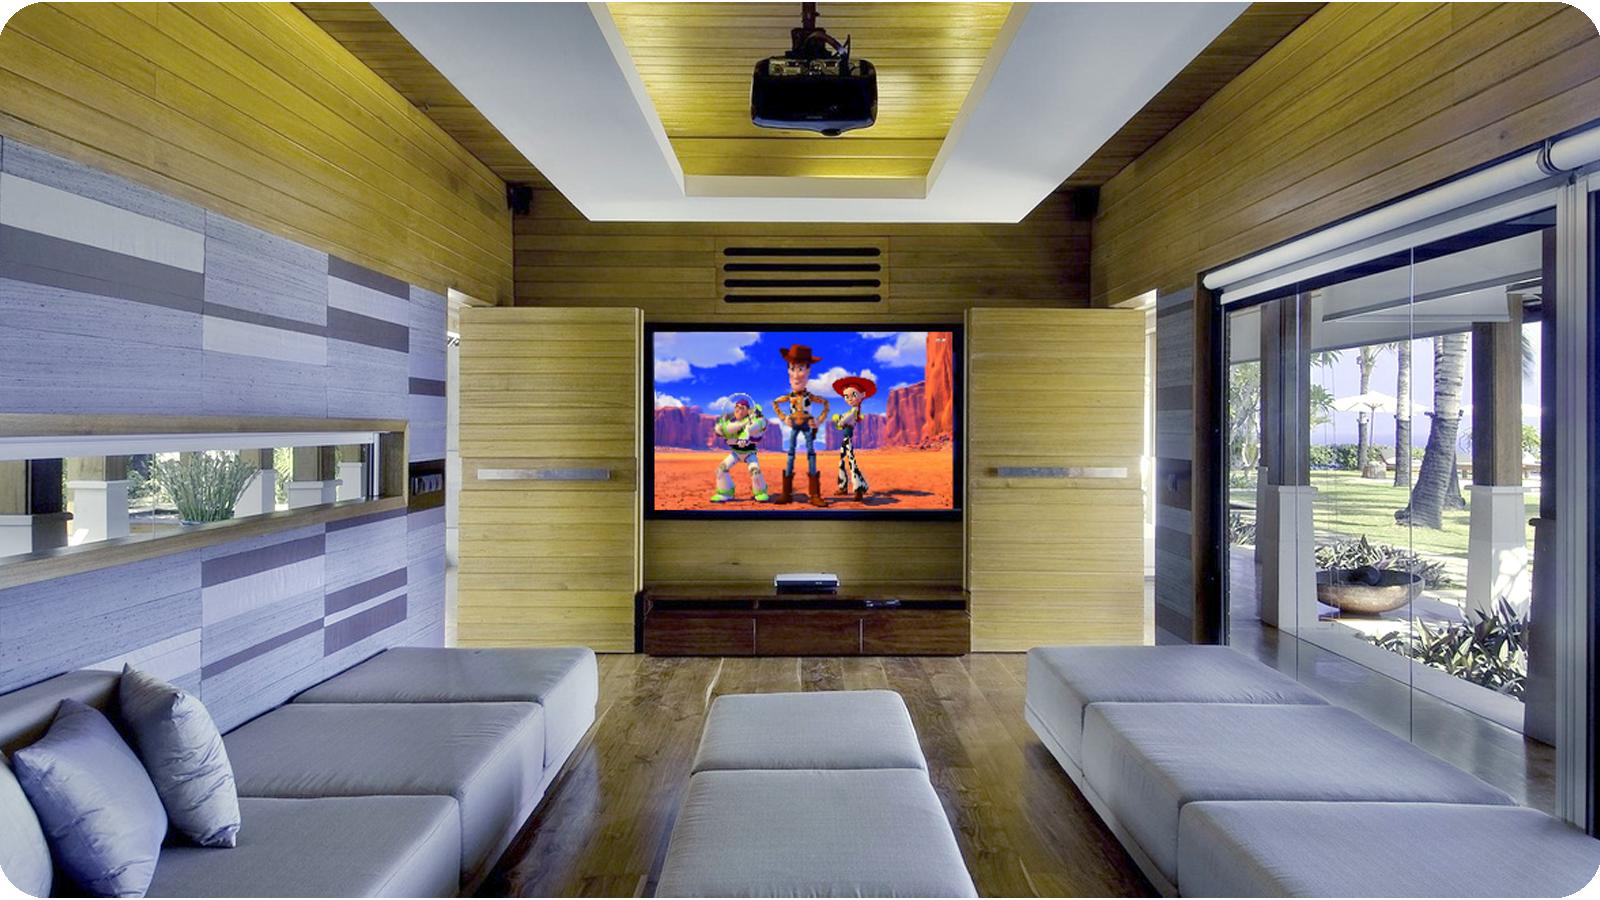 Toy Story Home CInema